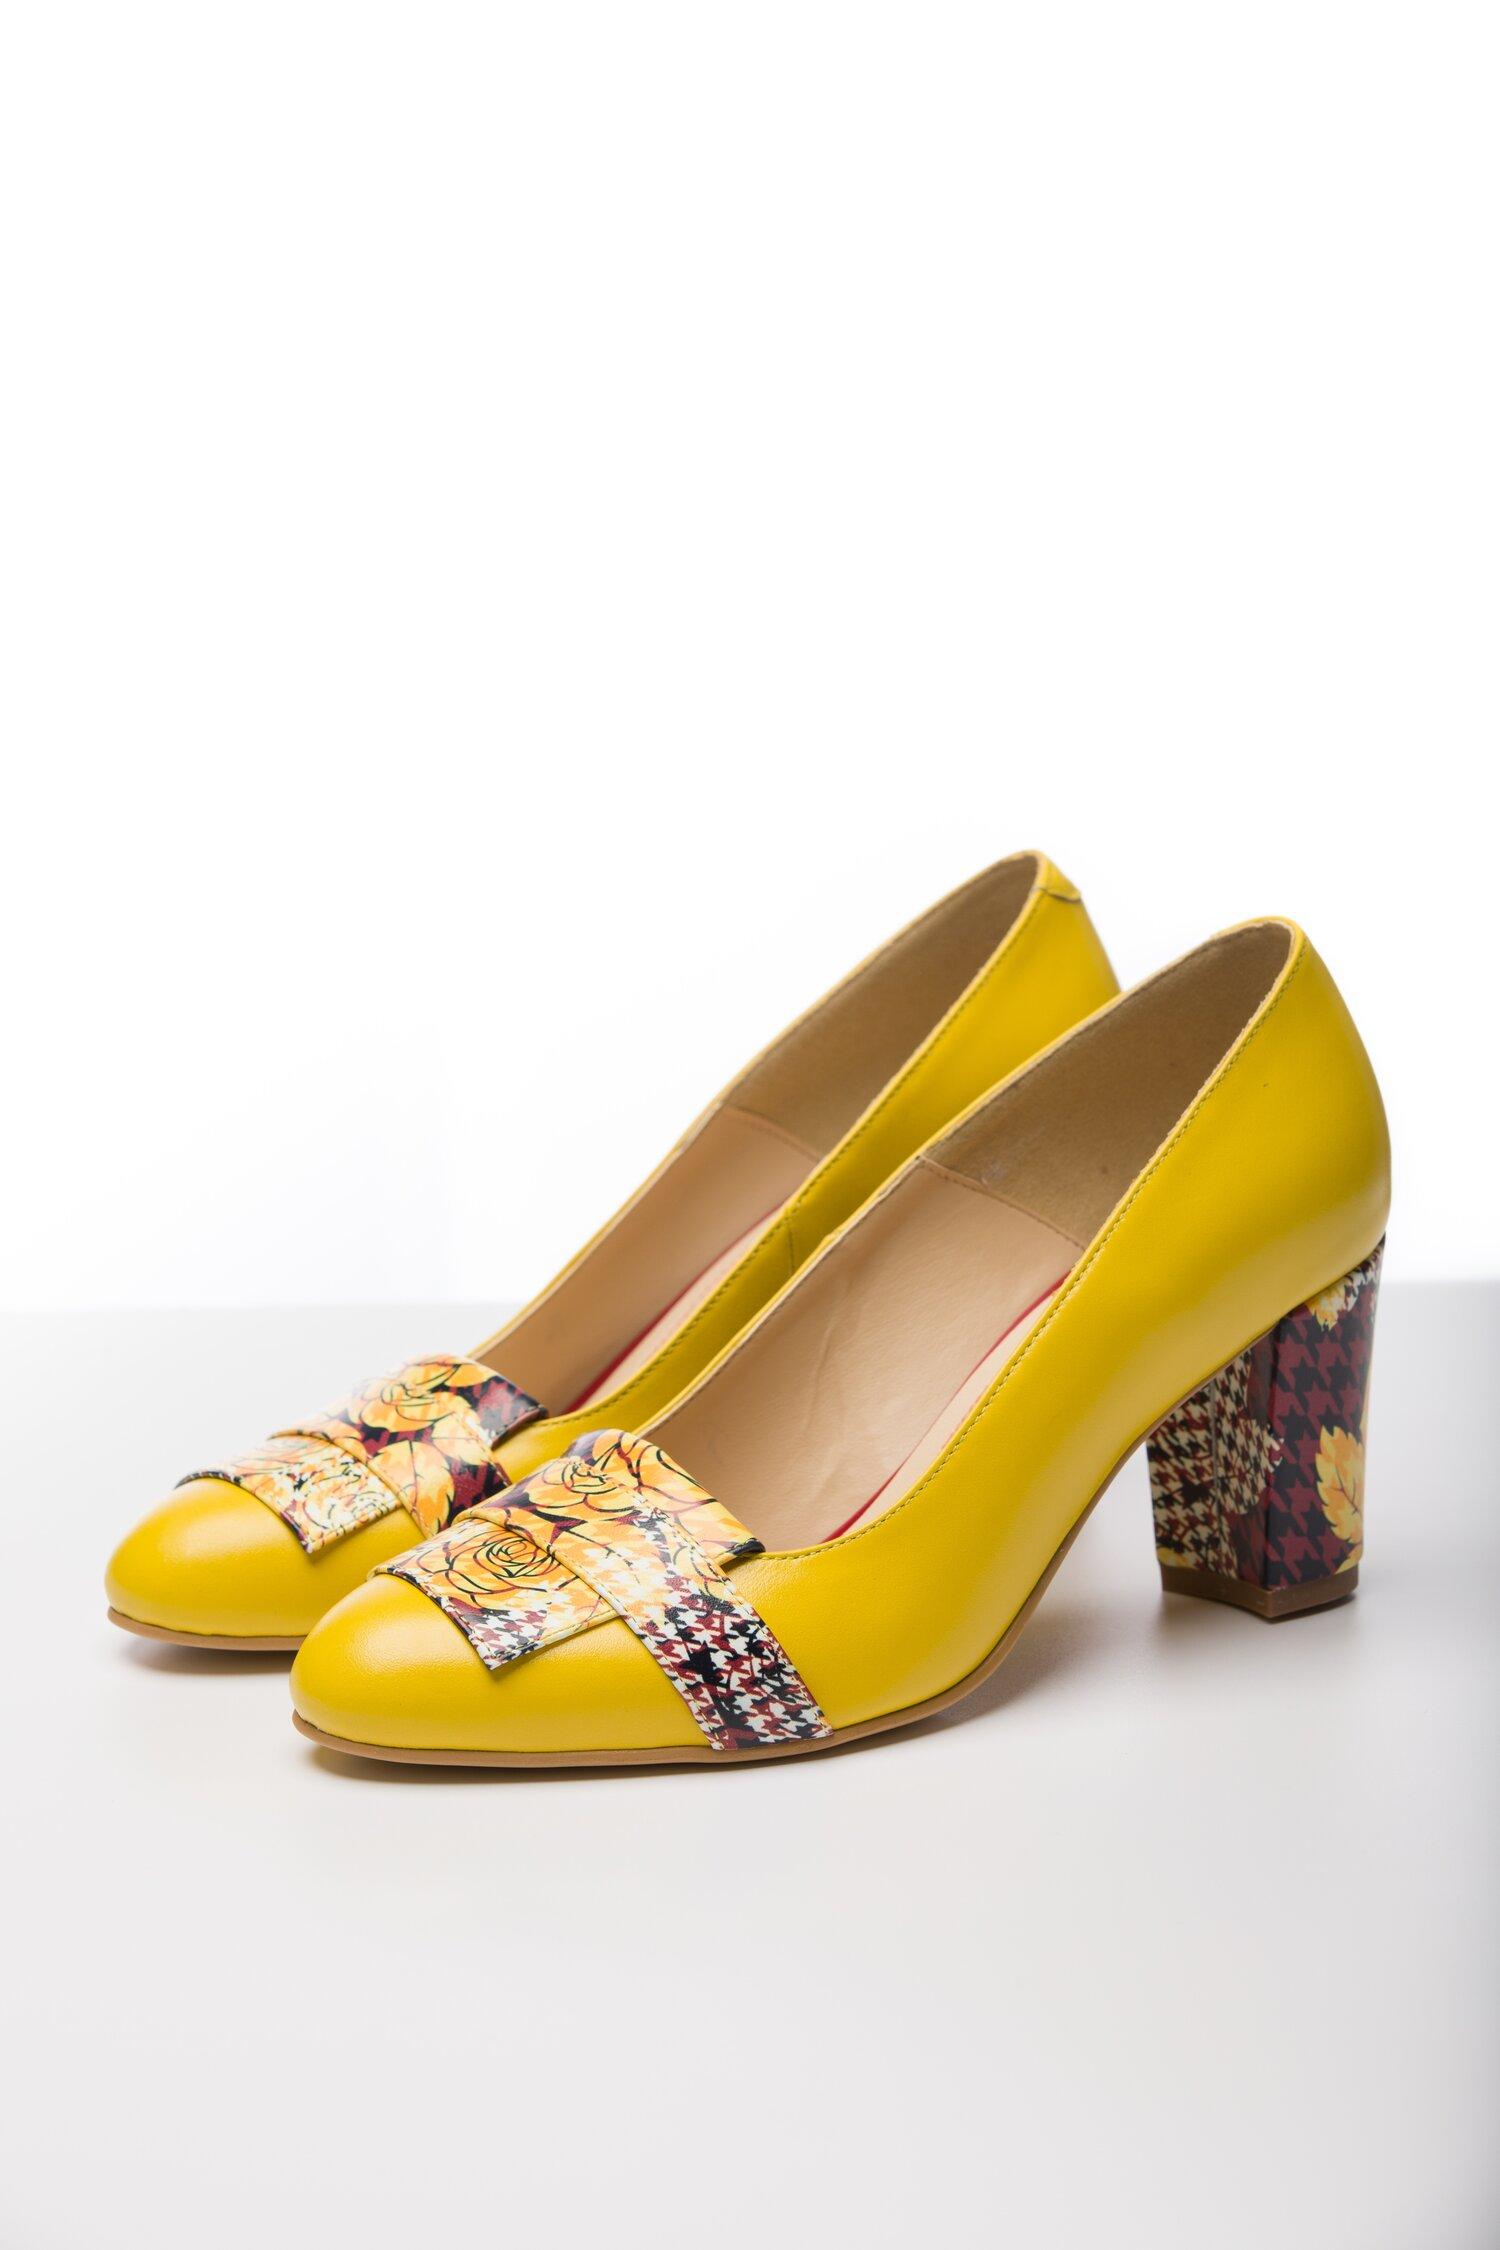 Pantofi galbeni cu insertii florale pe varf si pe toc imagine